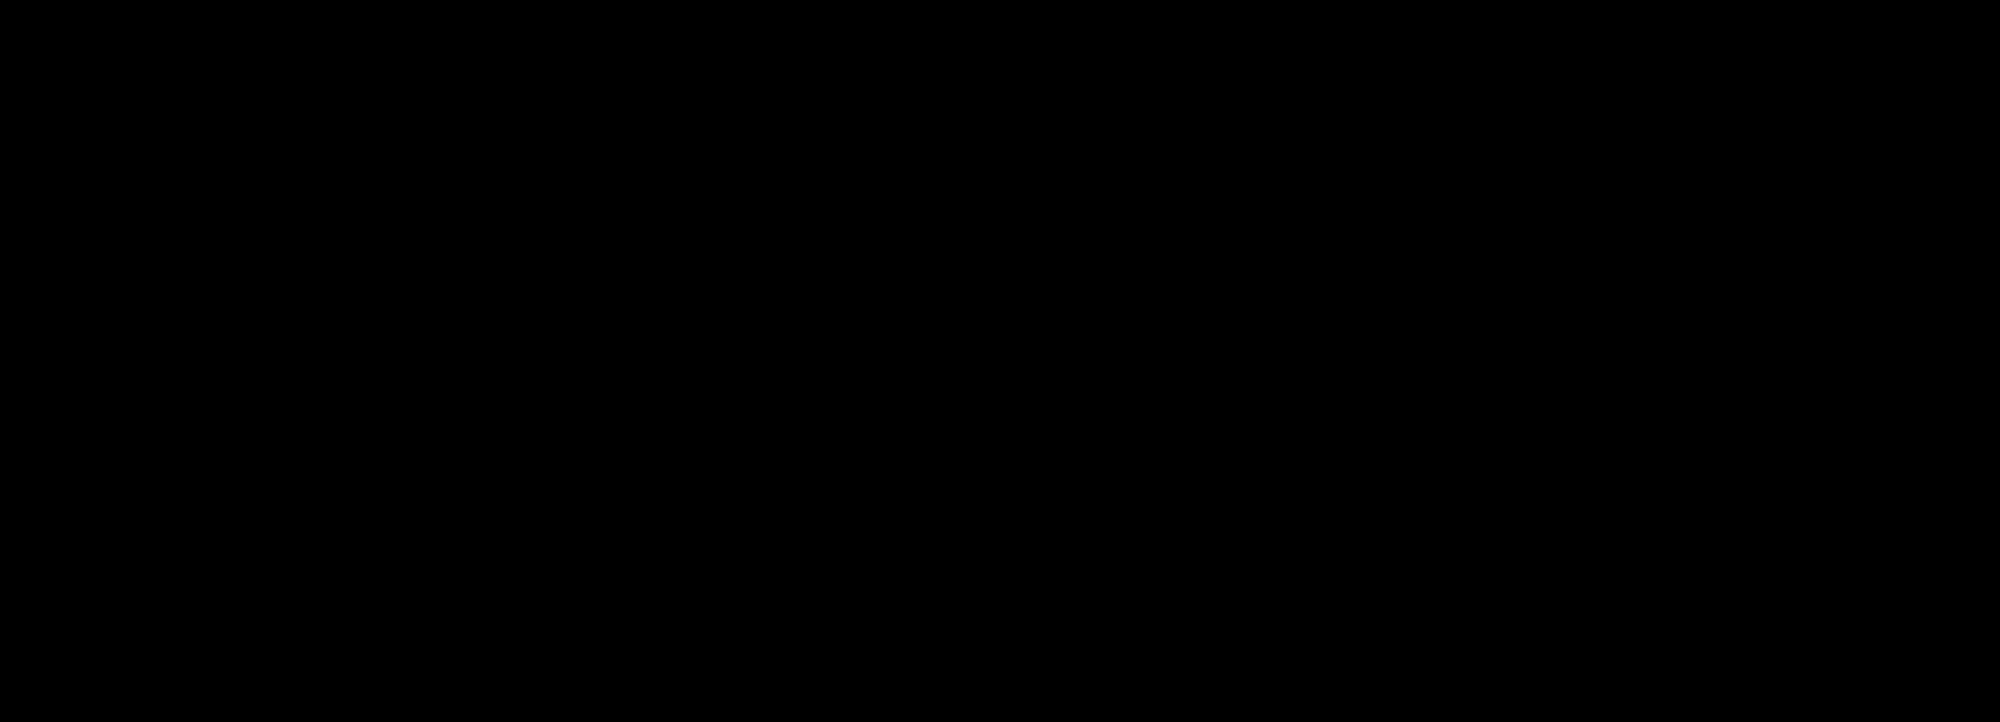 Bont-logo_BK.png